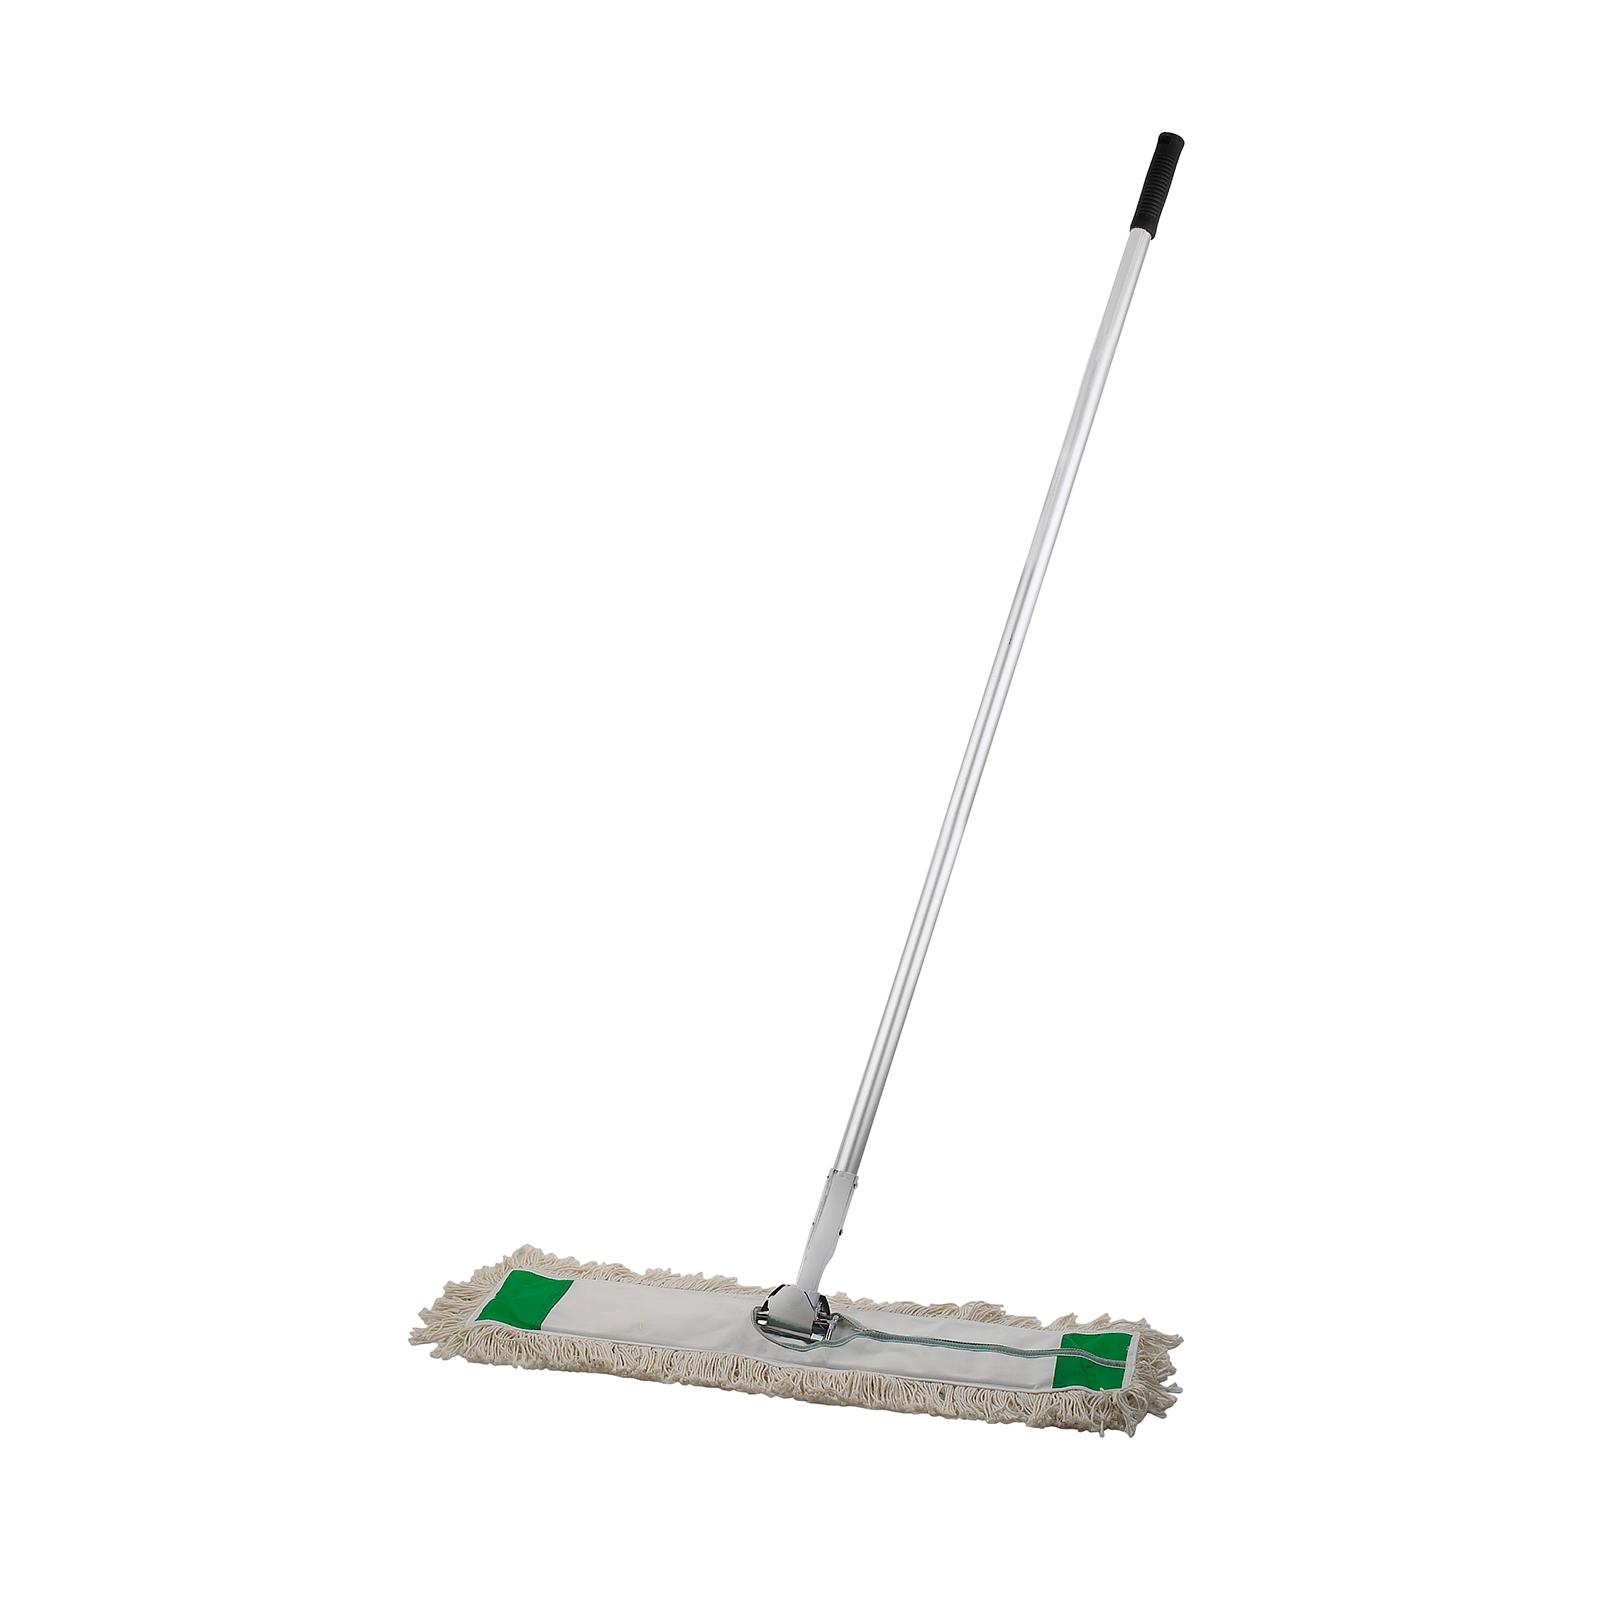 3700-141 Winco DM-24 dust mop